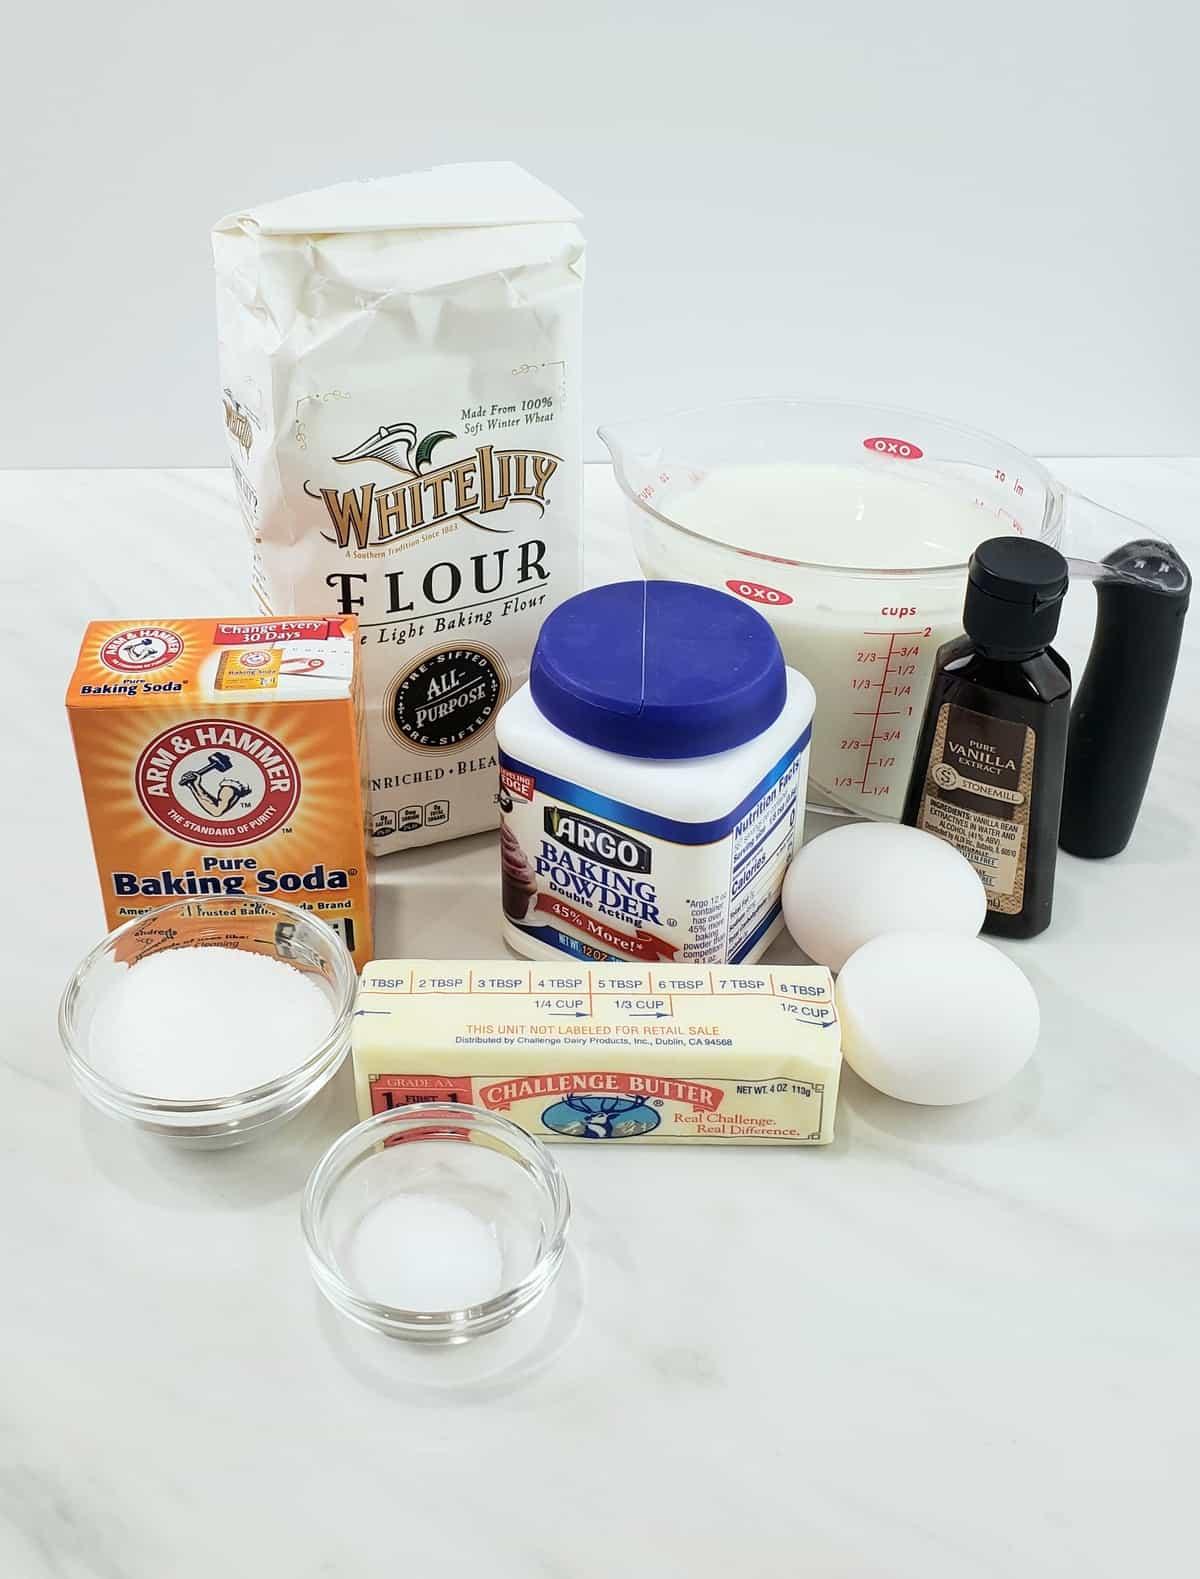 Ingredients: bag of flour, baking soda, butter, vanilla, milk in a measuring cup